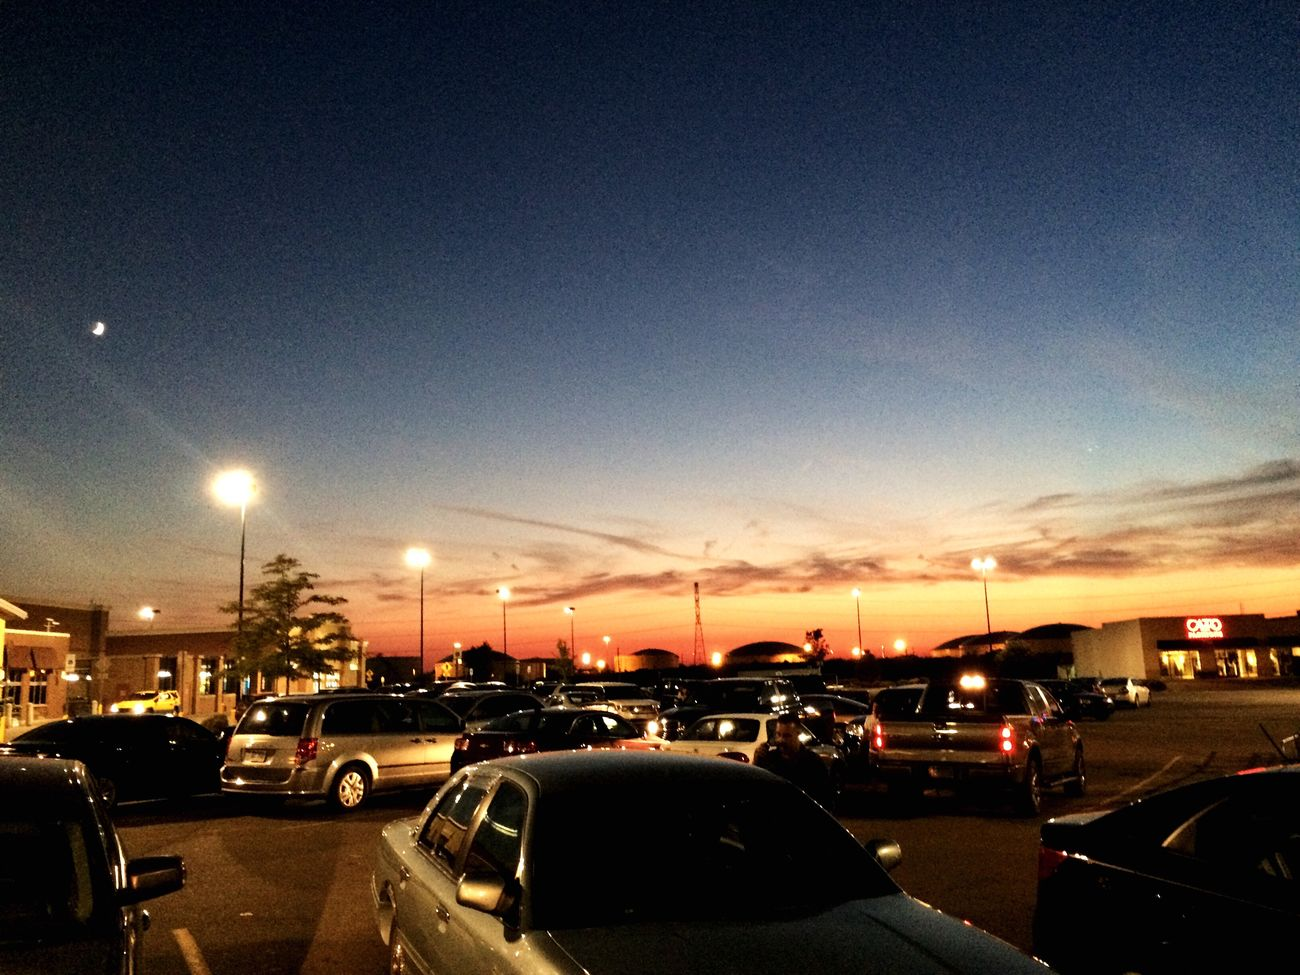 Walmart Parking Lot Sunset Orange Red Purple Blue Sky Cars Beautiful Evening